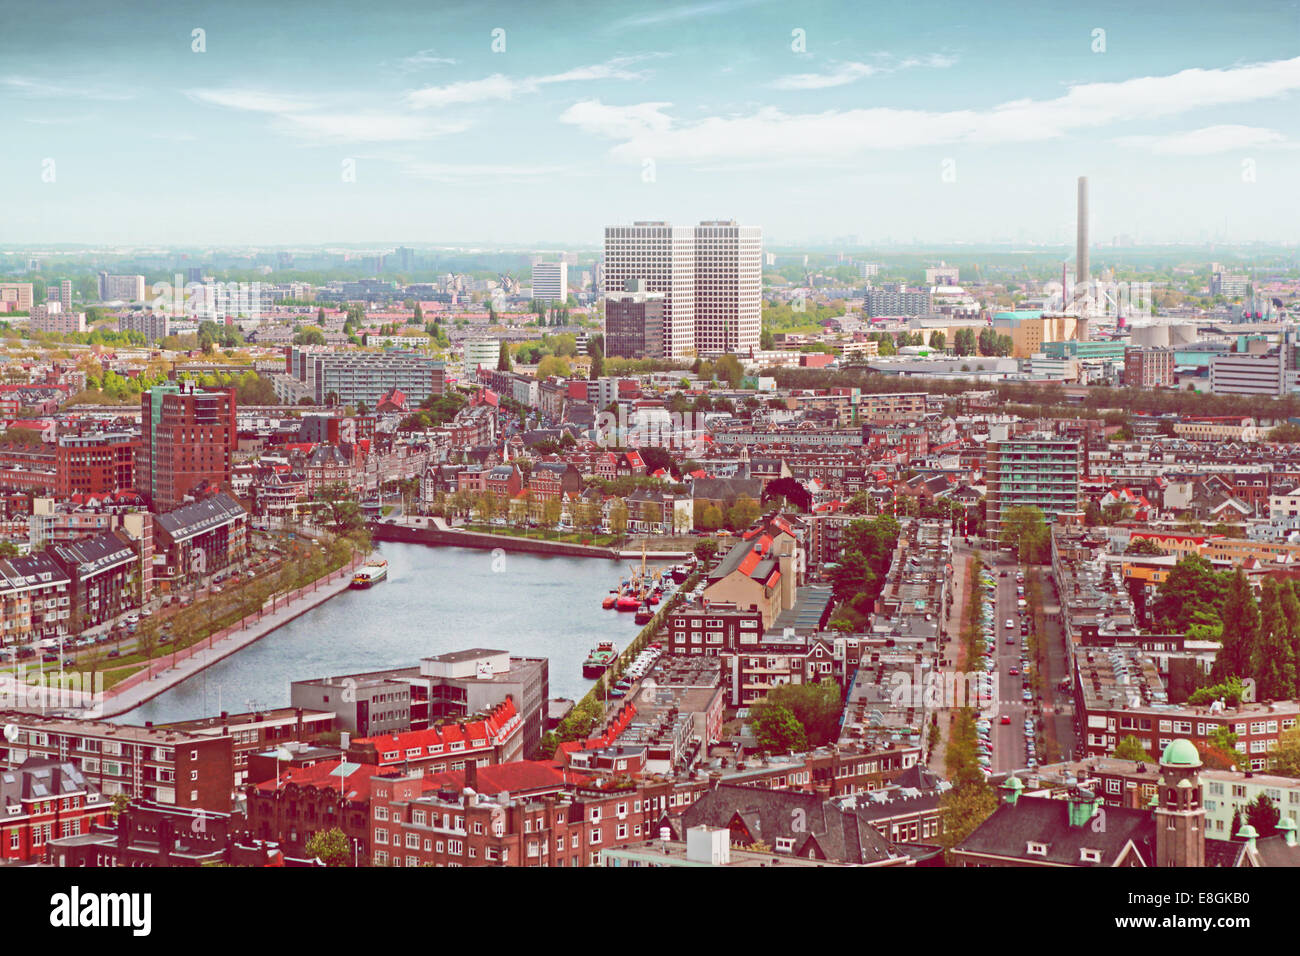 Holanda, Vista de Rotterdam Imagen De Stock